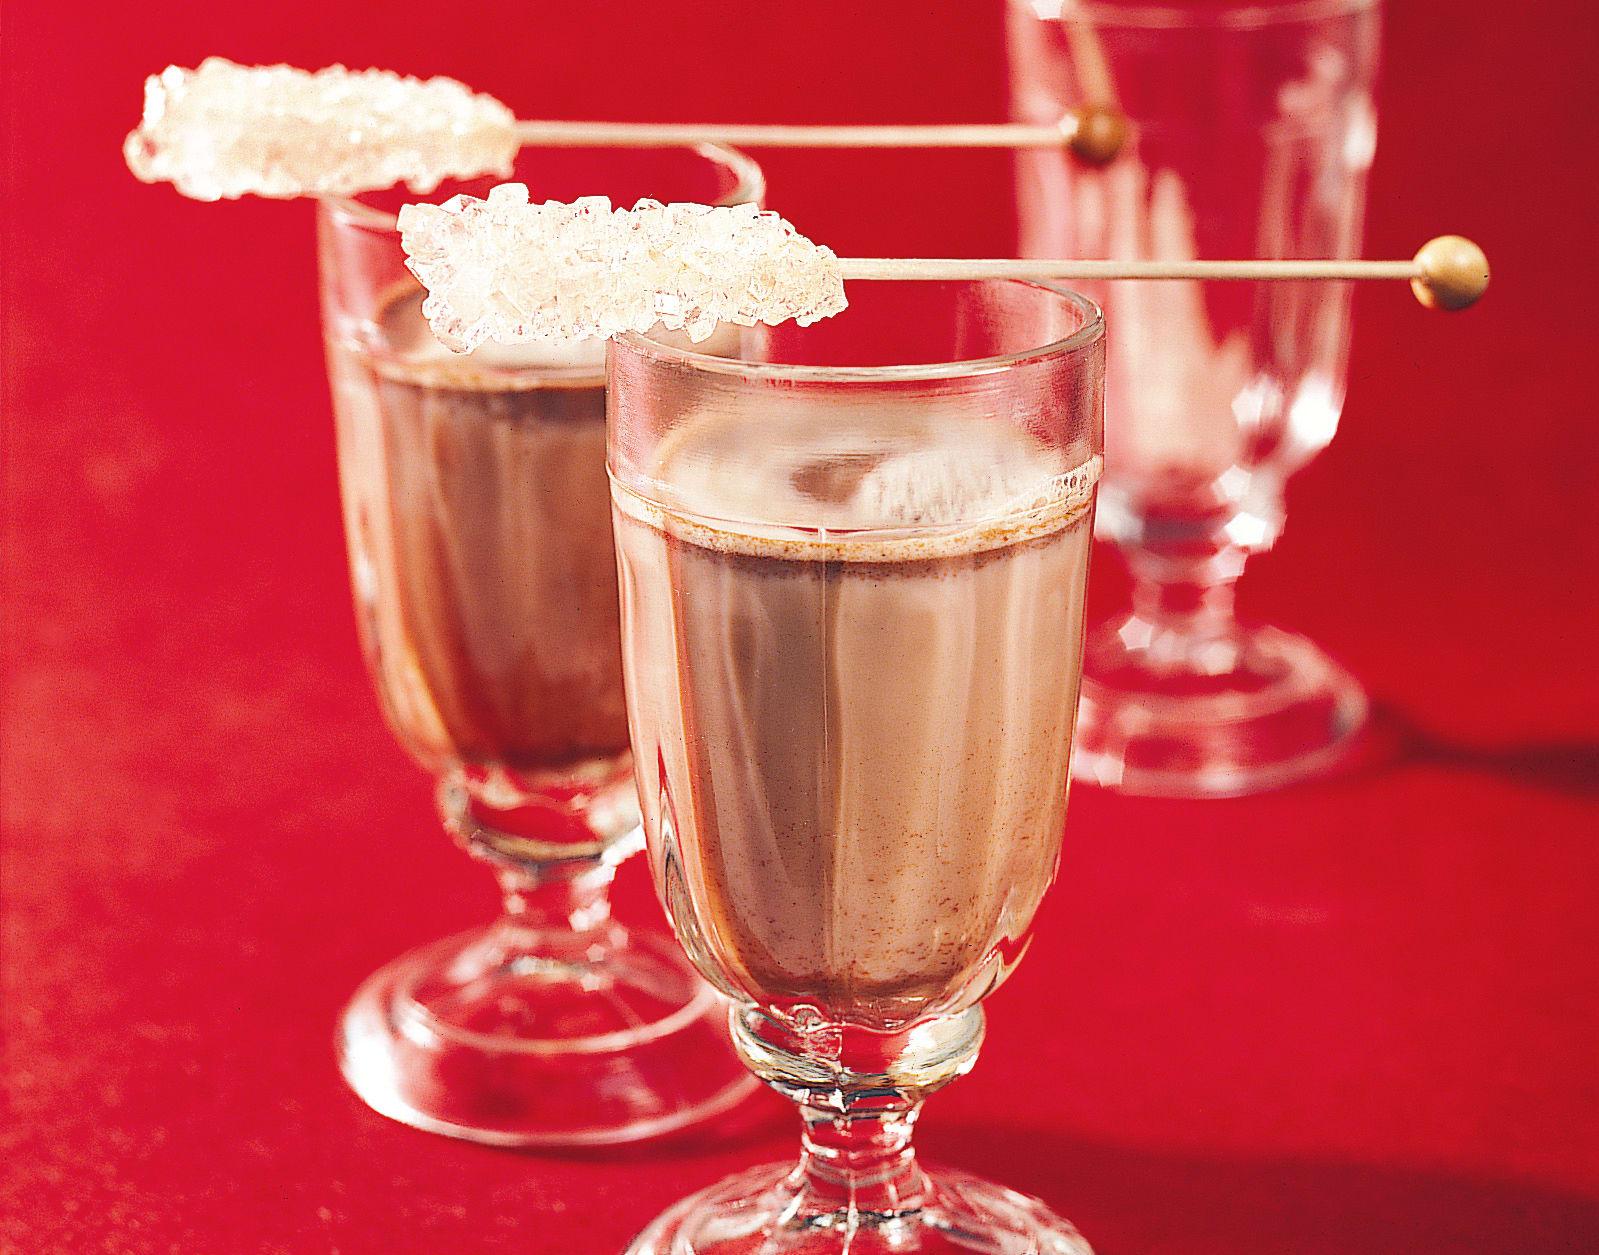 Schokolade-Schwarztee